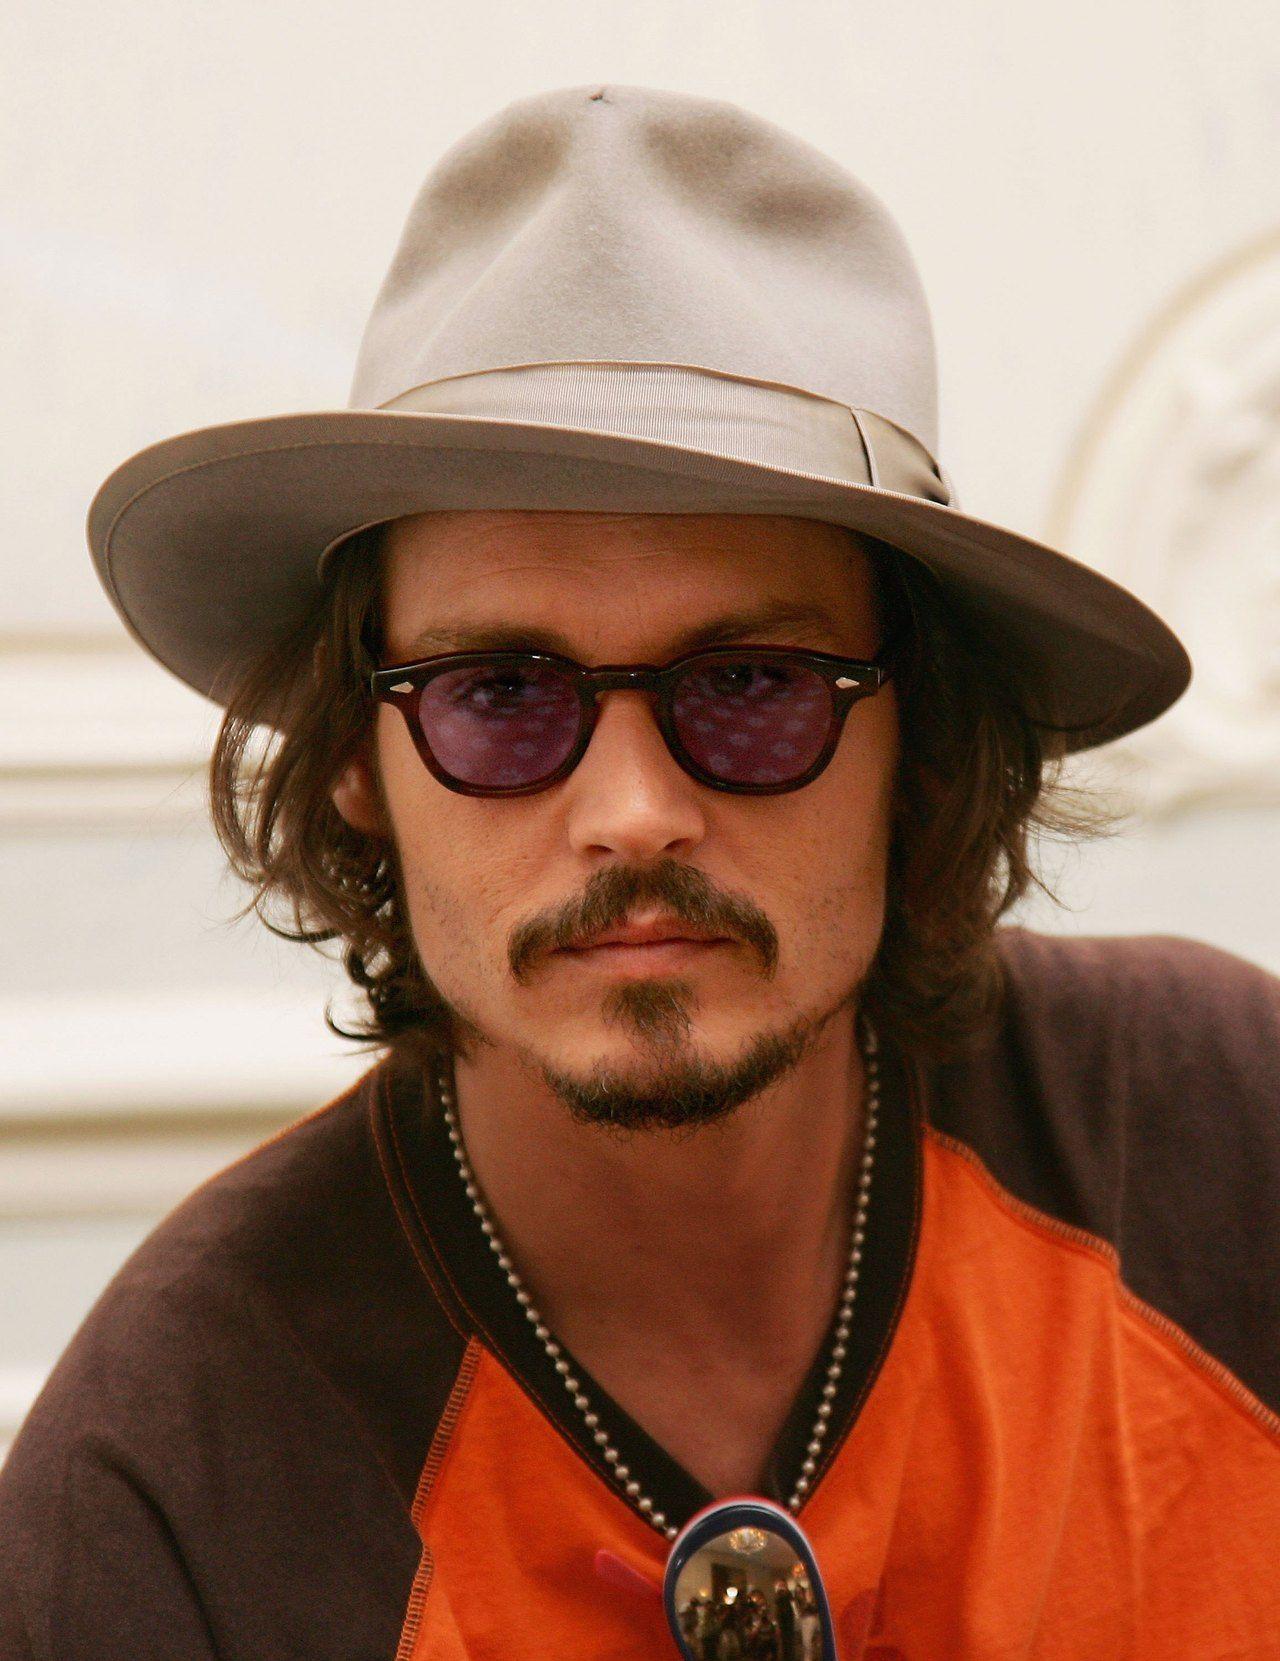 salvare a0f09 89298 Johnny Depp Sunglasses Moscot | La Confédération Nationale ...